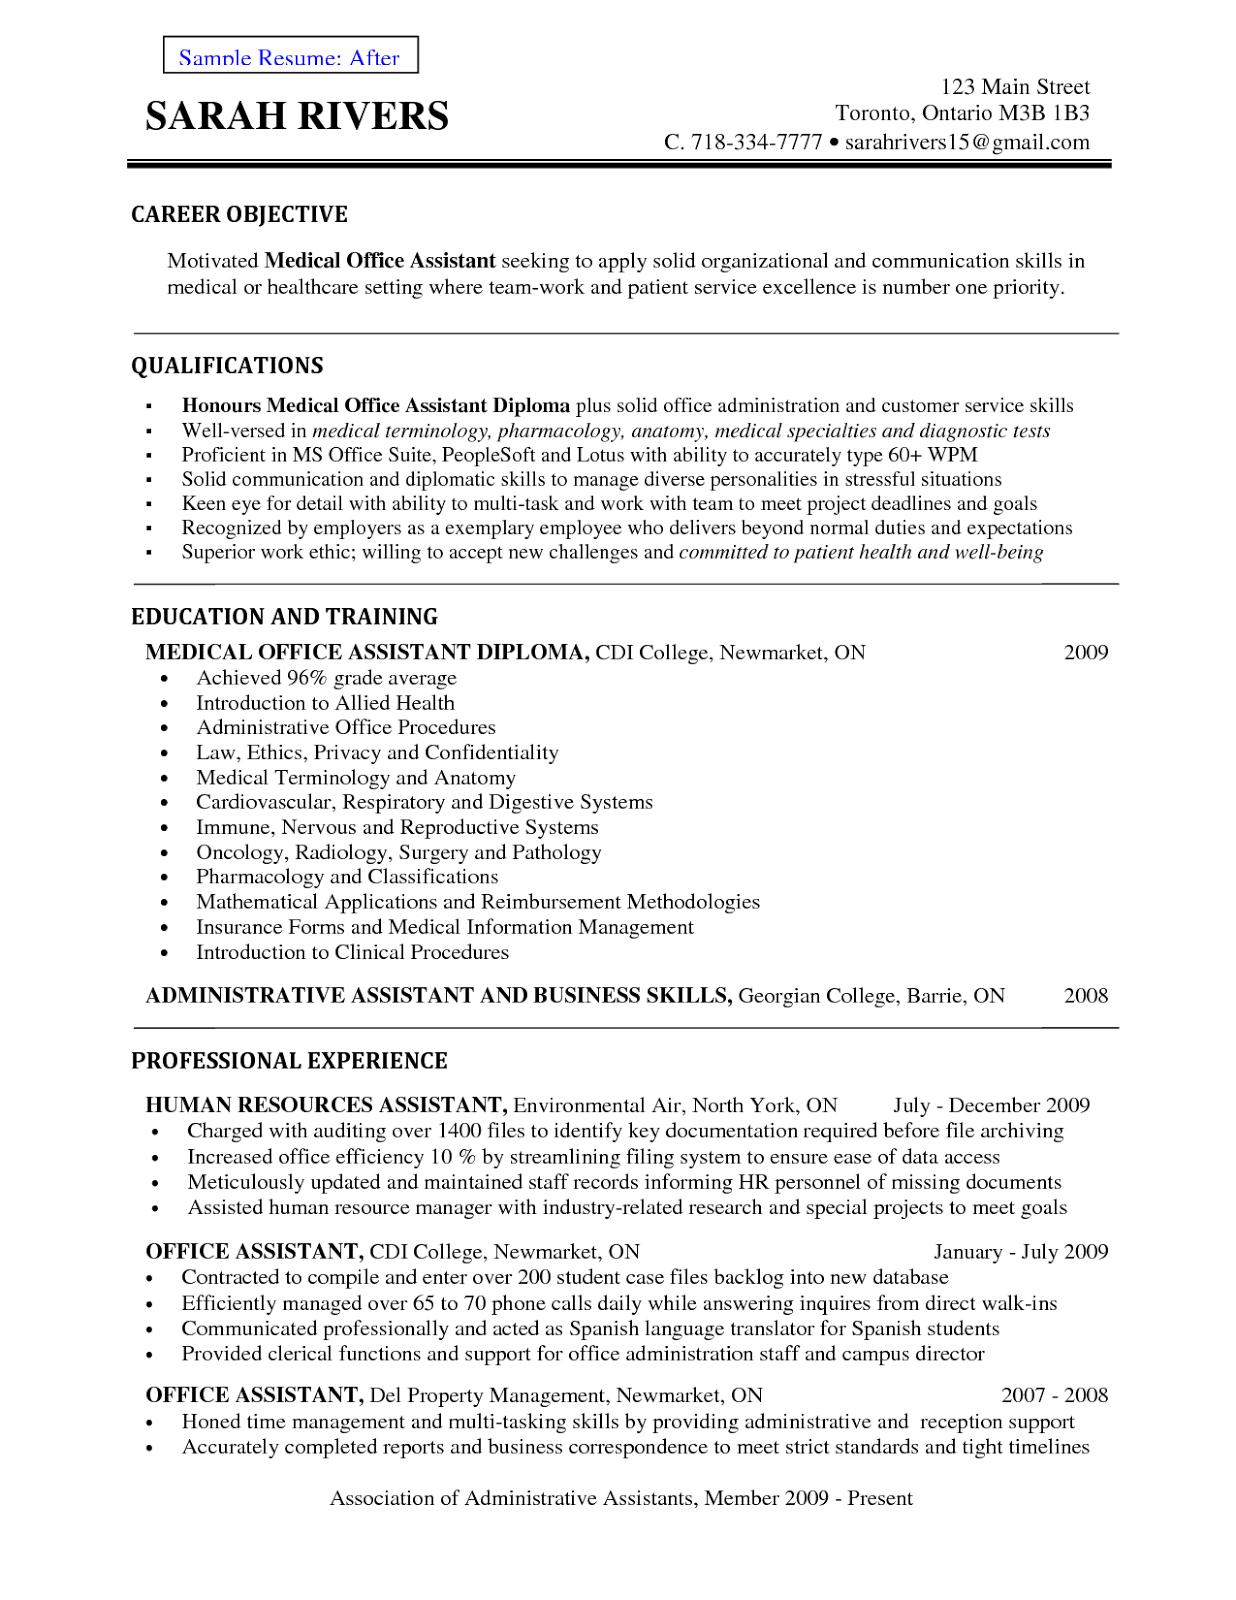 help building resume